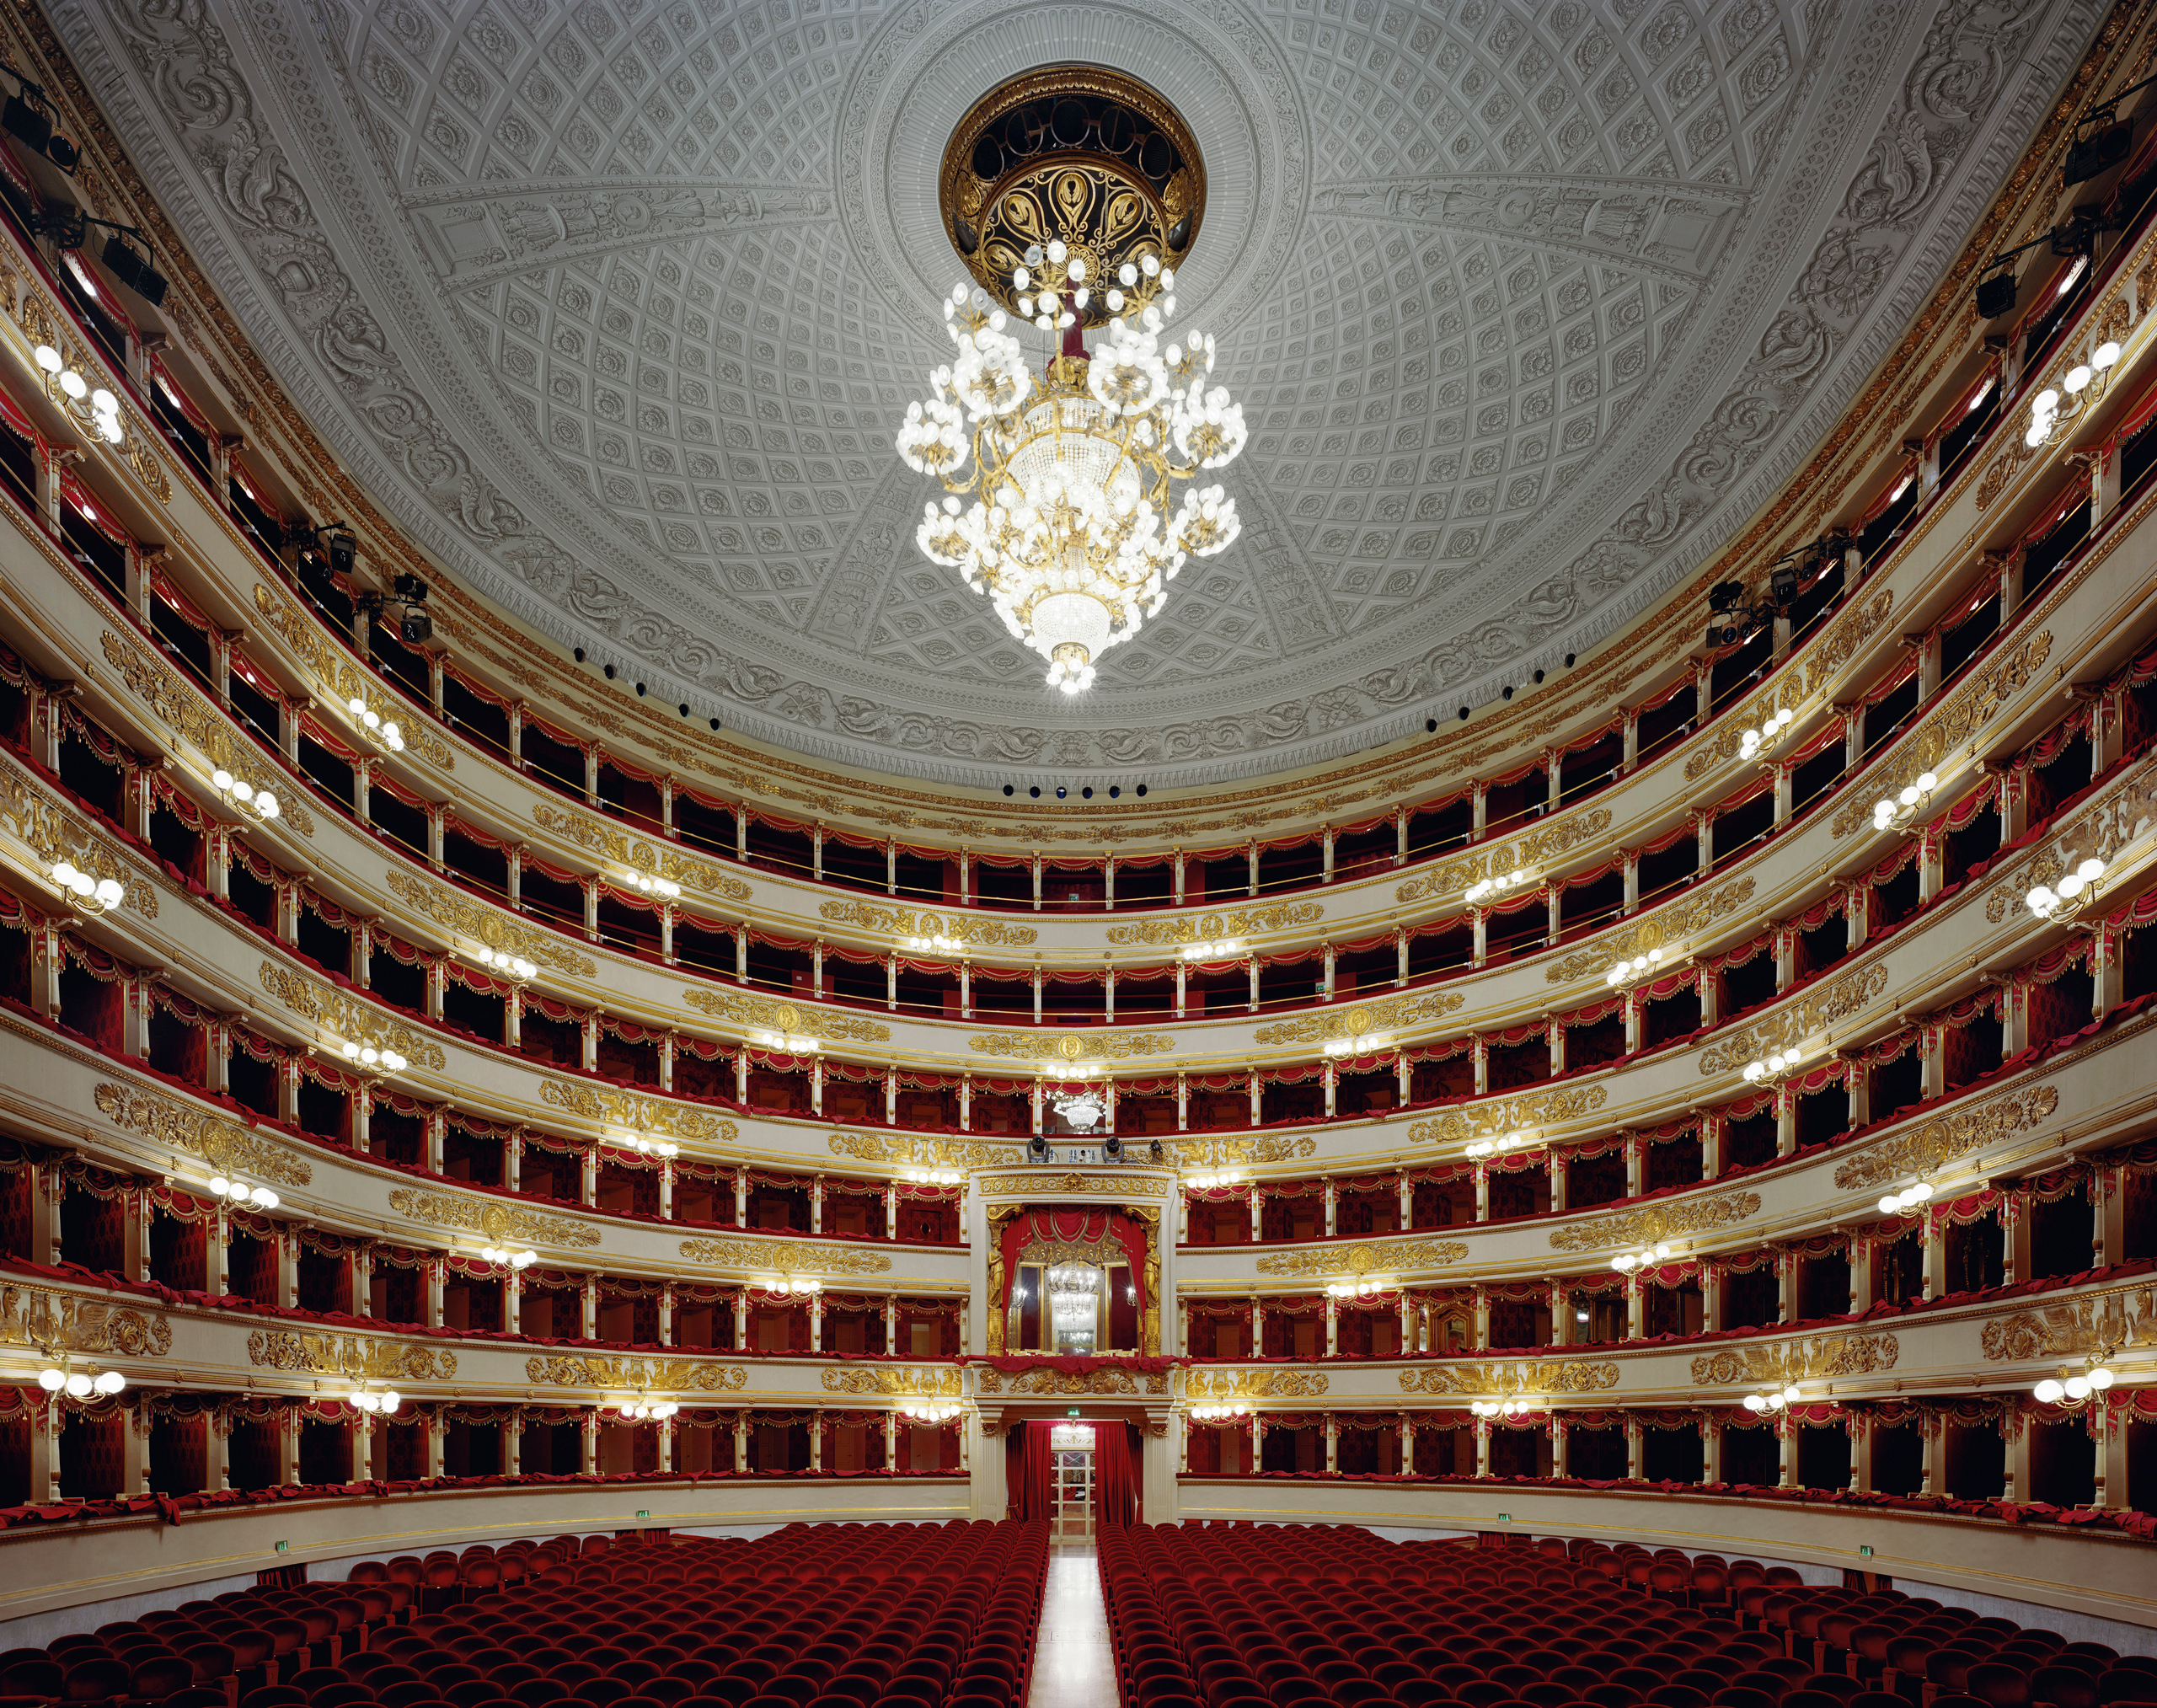 Teatro alla Scala Milan, Italy, 2008